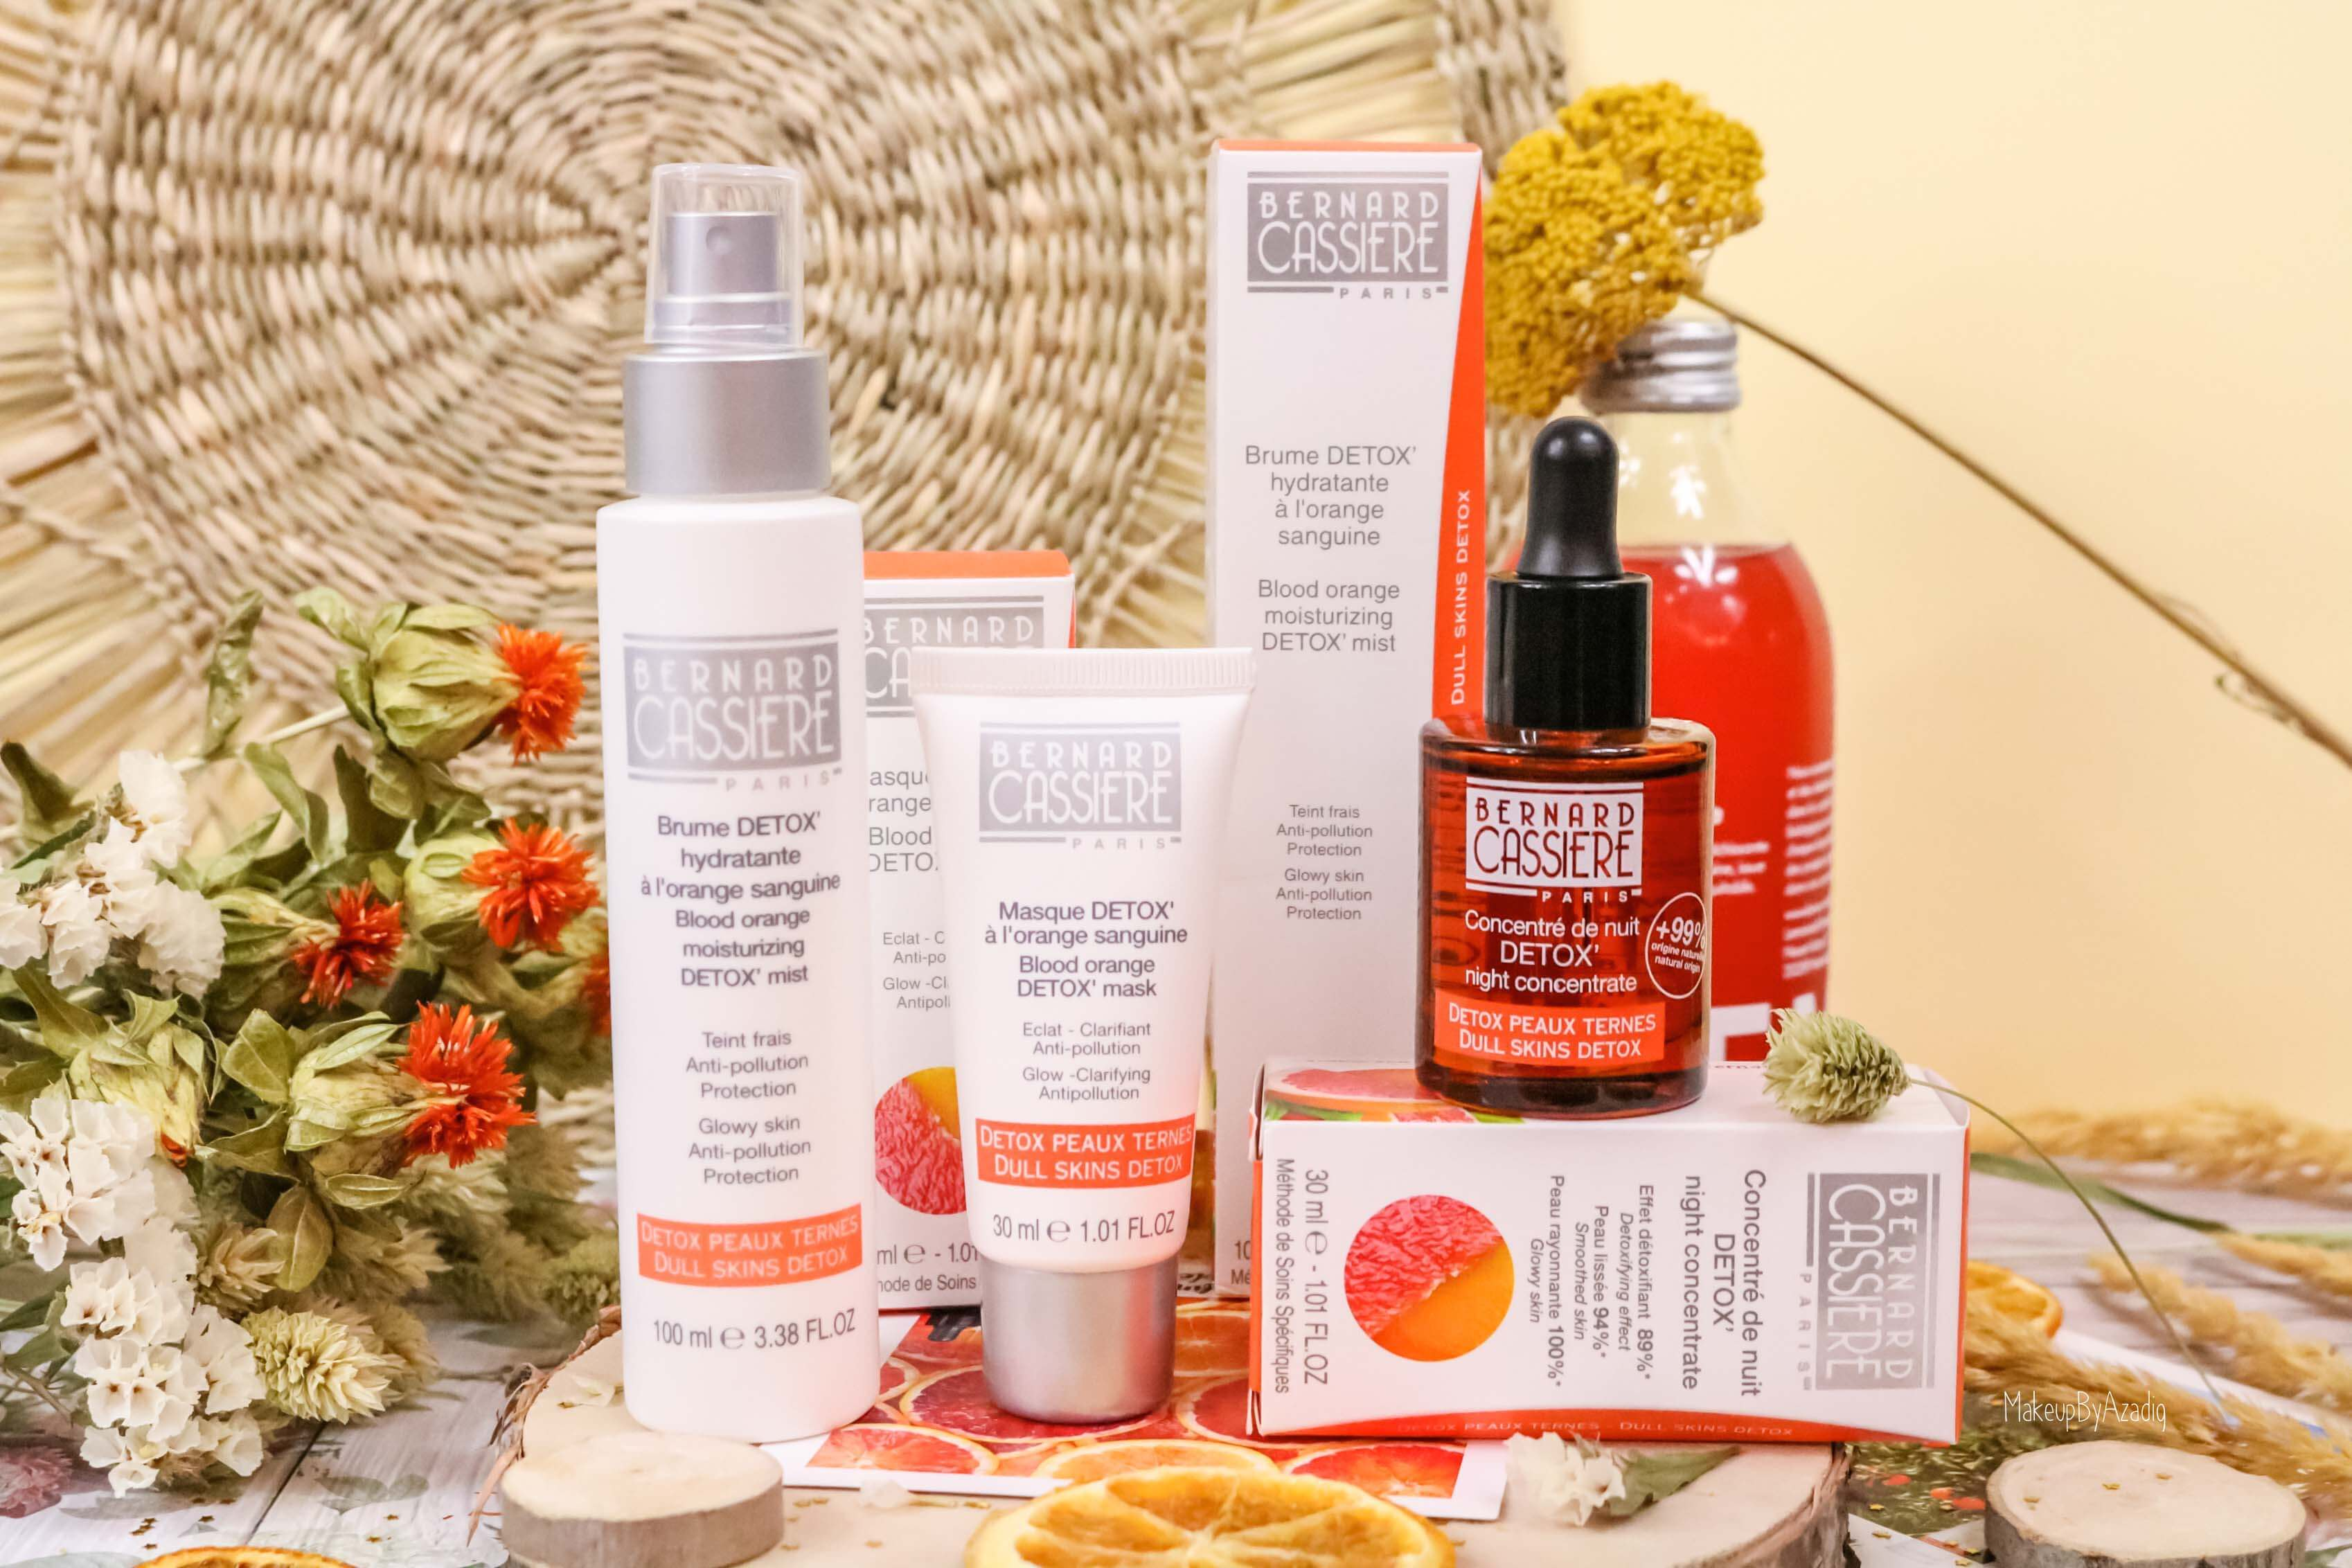 revue-produits-bernard-cassiere-bio-detox-orange-sanguine-masque-paris-institut-concentre-nuit-avis-prix-soin-makeupbyazadig-soin-naturel